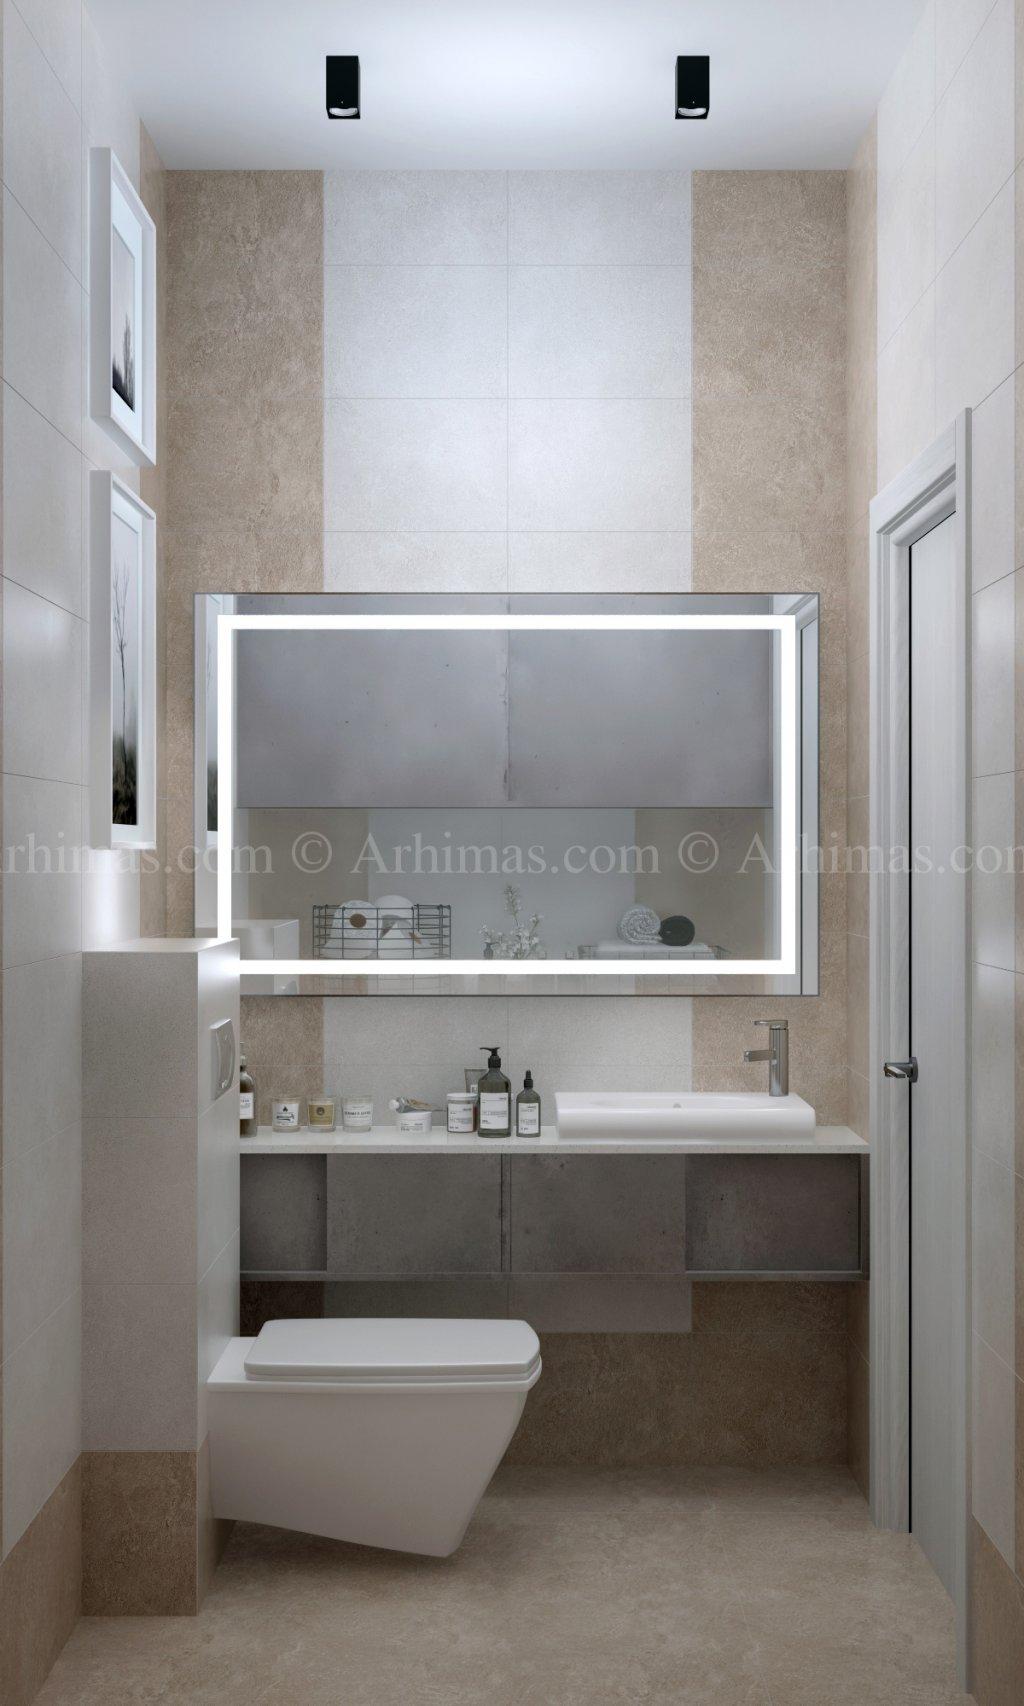 Архитектурная мастерская Архимас - Дизайн интерьера